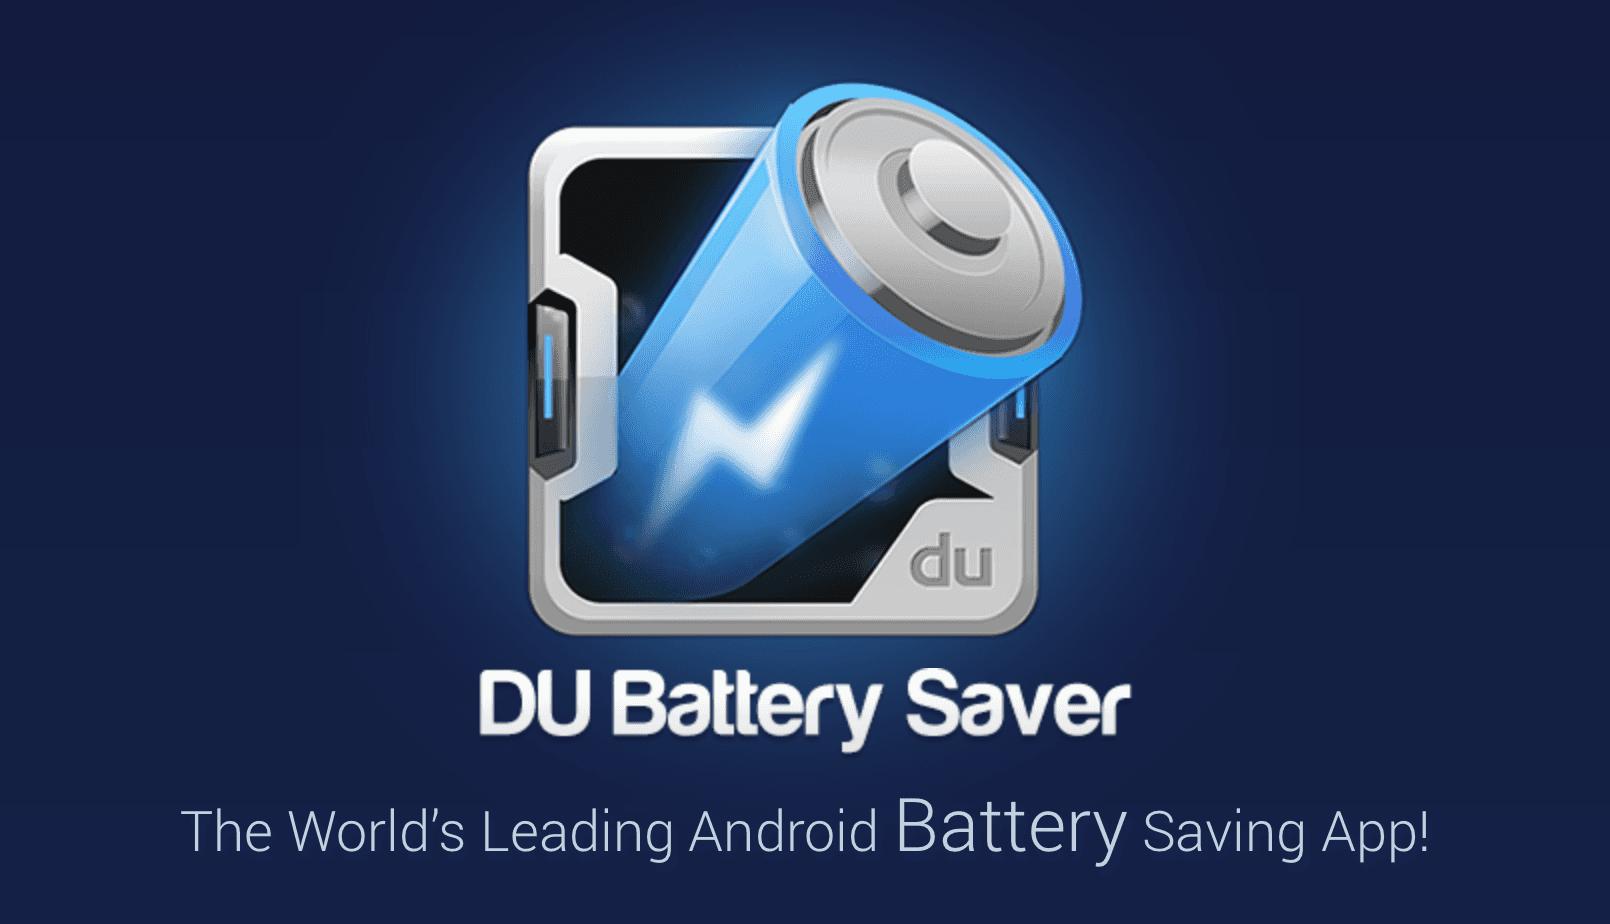 Du Battery Saver App - 1610x924 Wallpaper - teahub.io